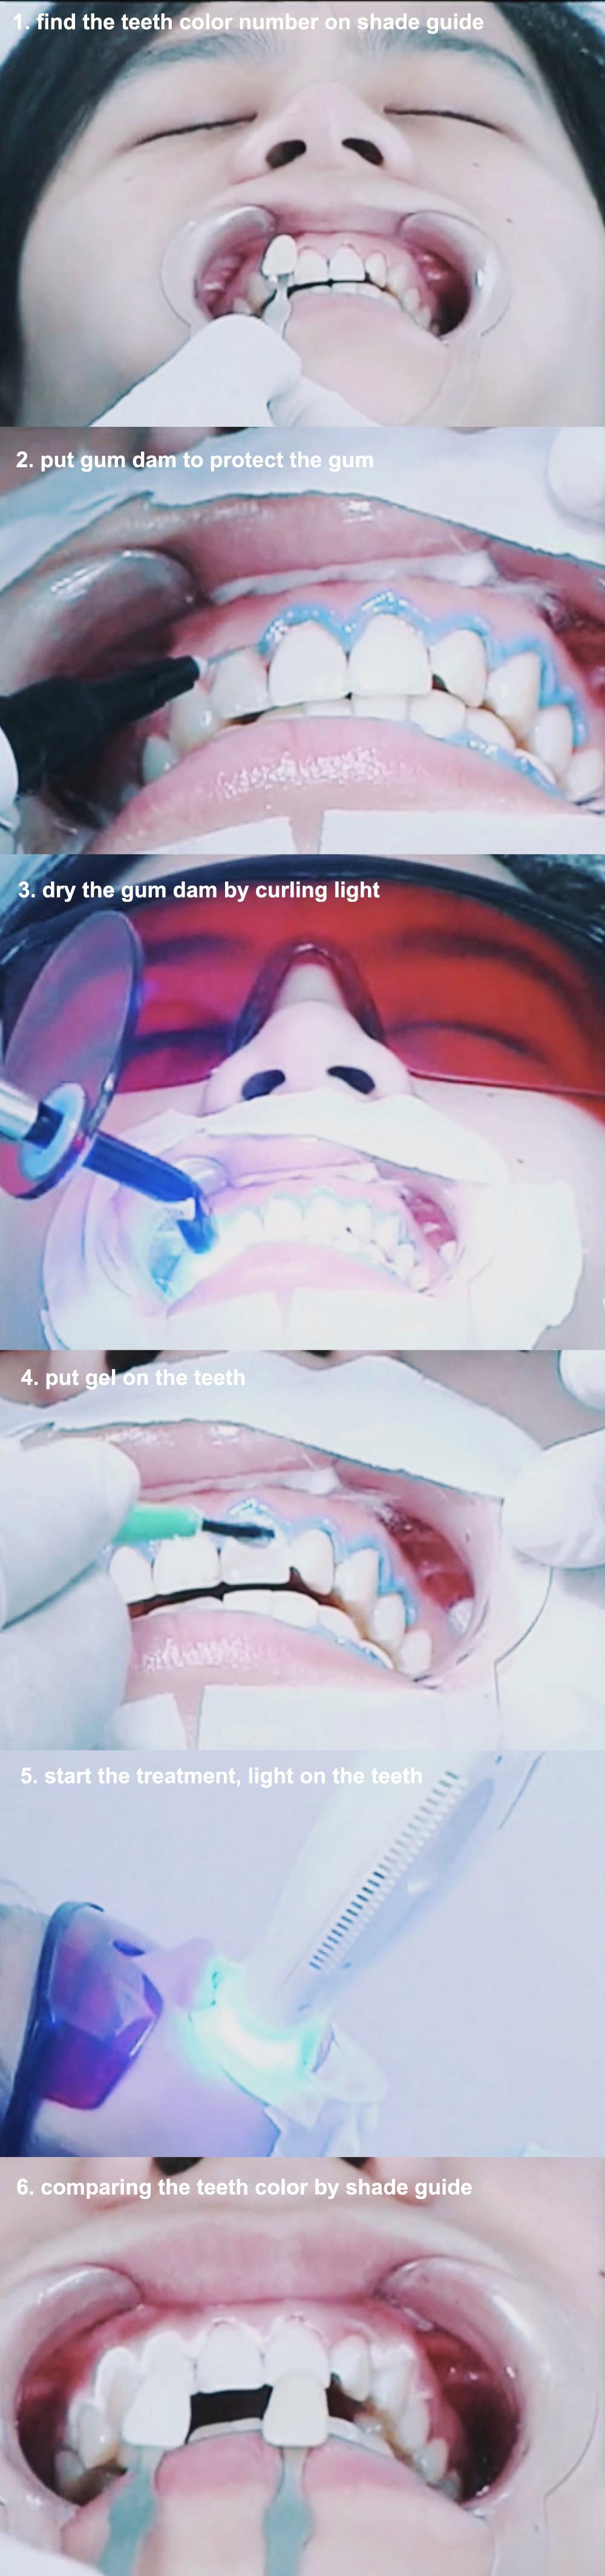 teeth-whiten-treatment